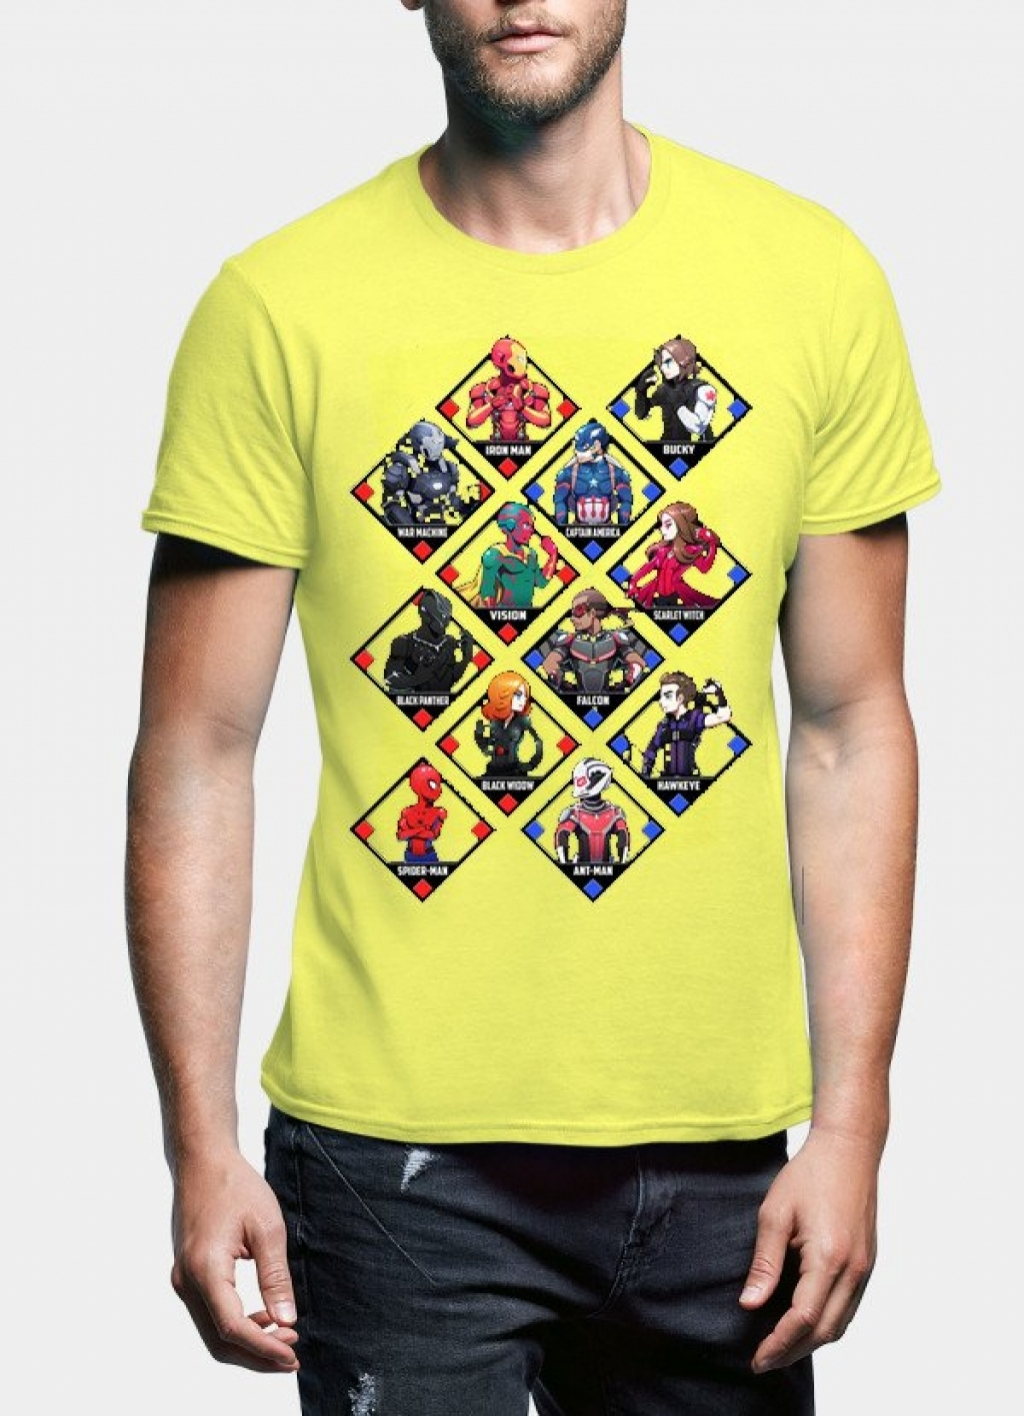 14964116650_Captain_America_Men_T-Shirt_in_Yellow.jpg